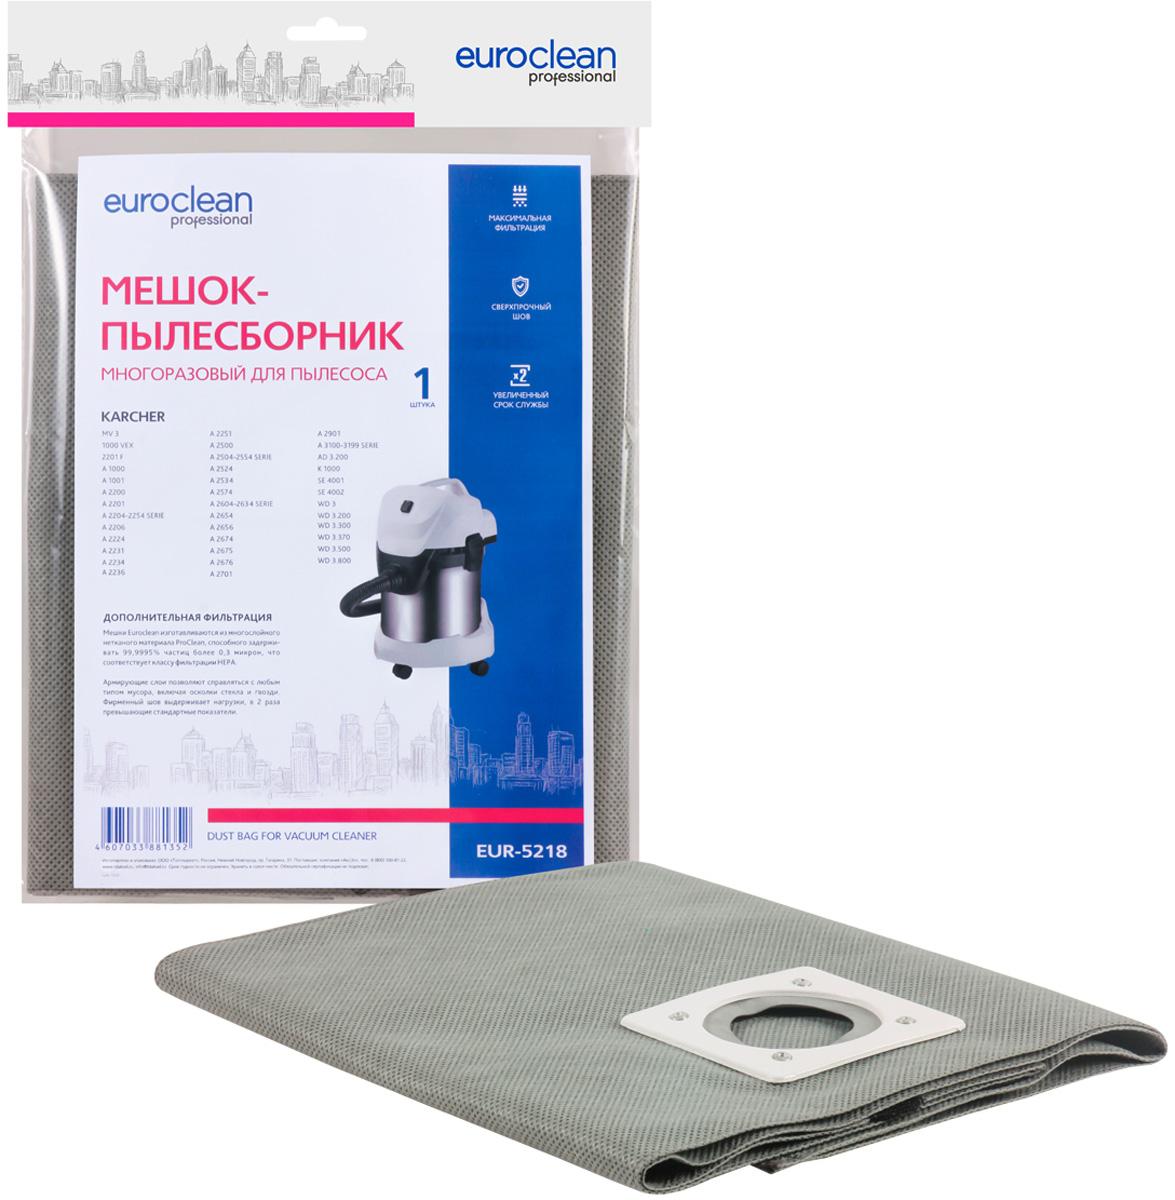 все цены на Euroclean EUR-5218 многоразовый пылесборник для пылесоса KARCHER, 1 шт